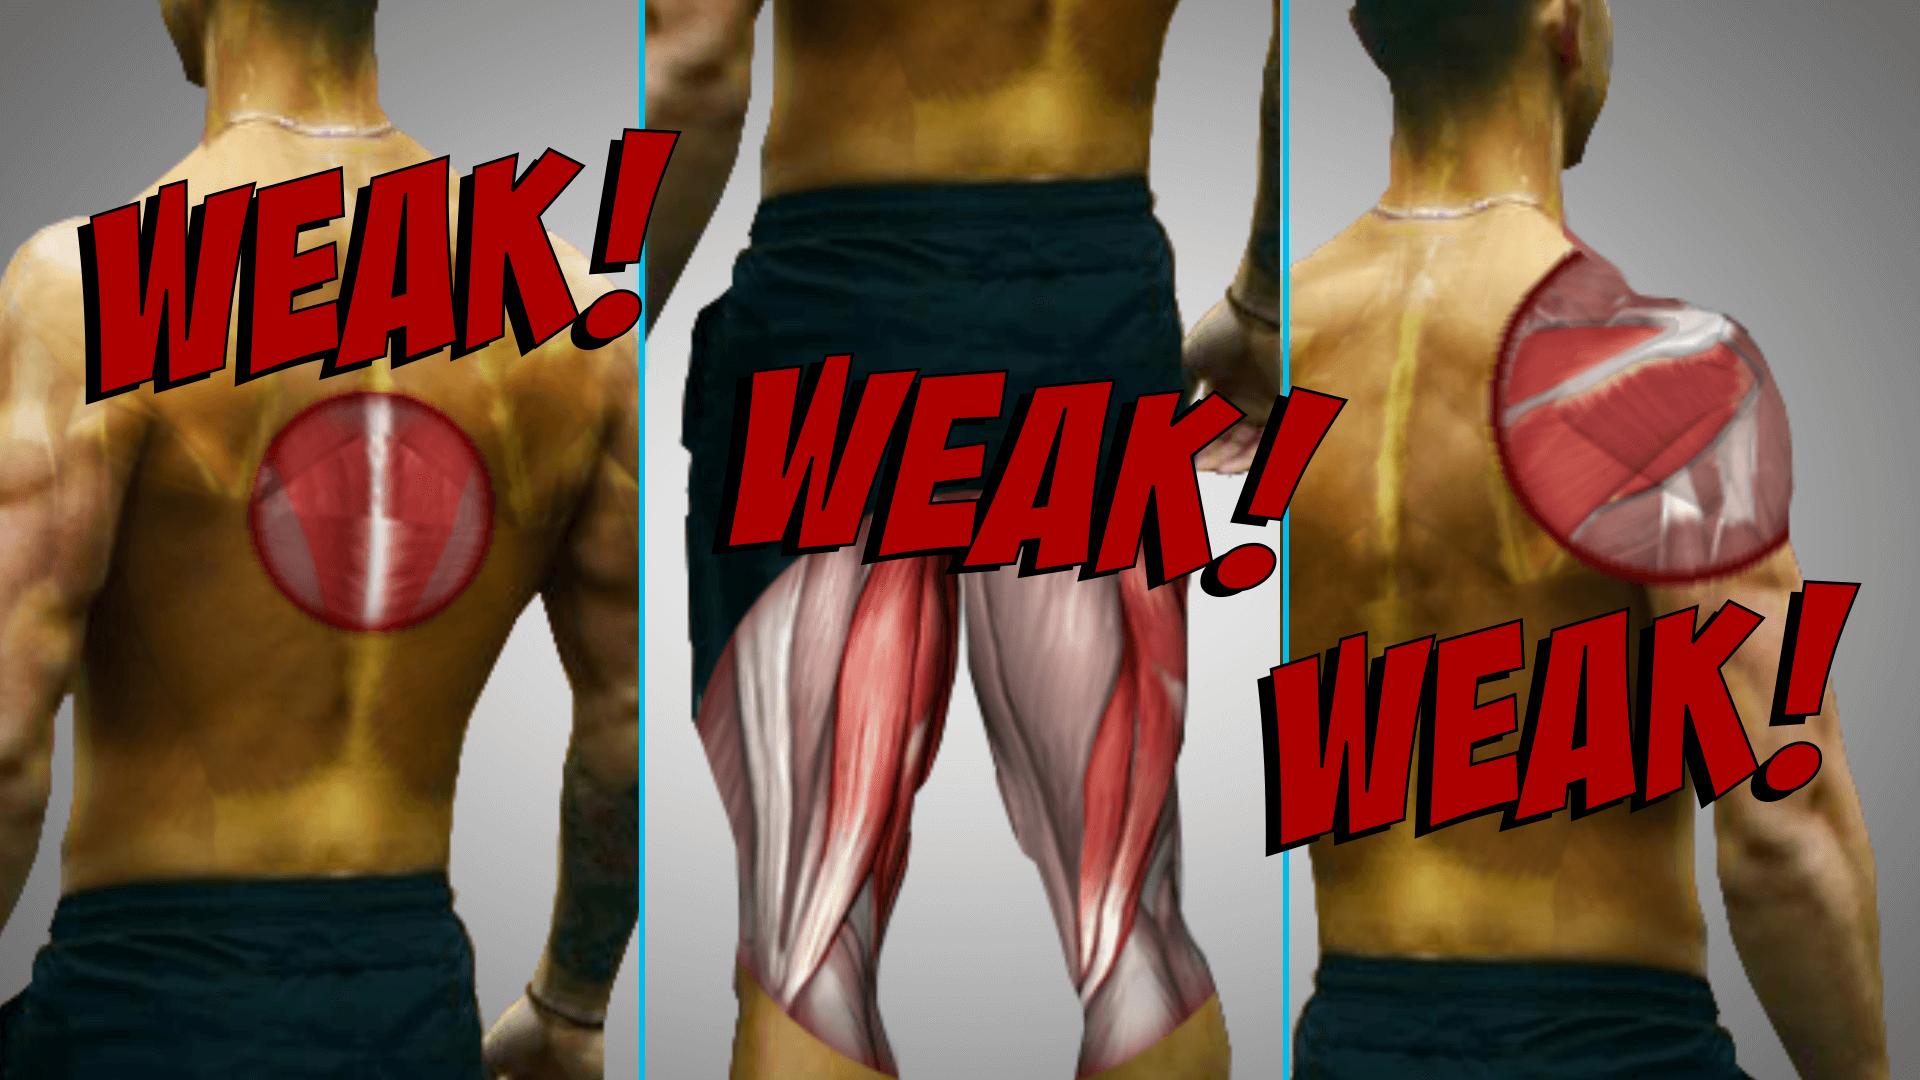 Muscle Imbalance Thumbnail